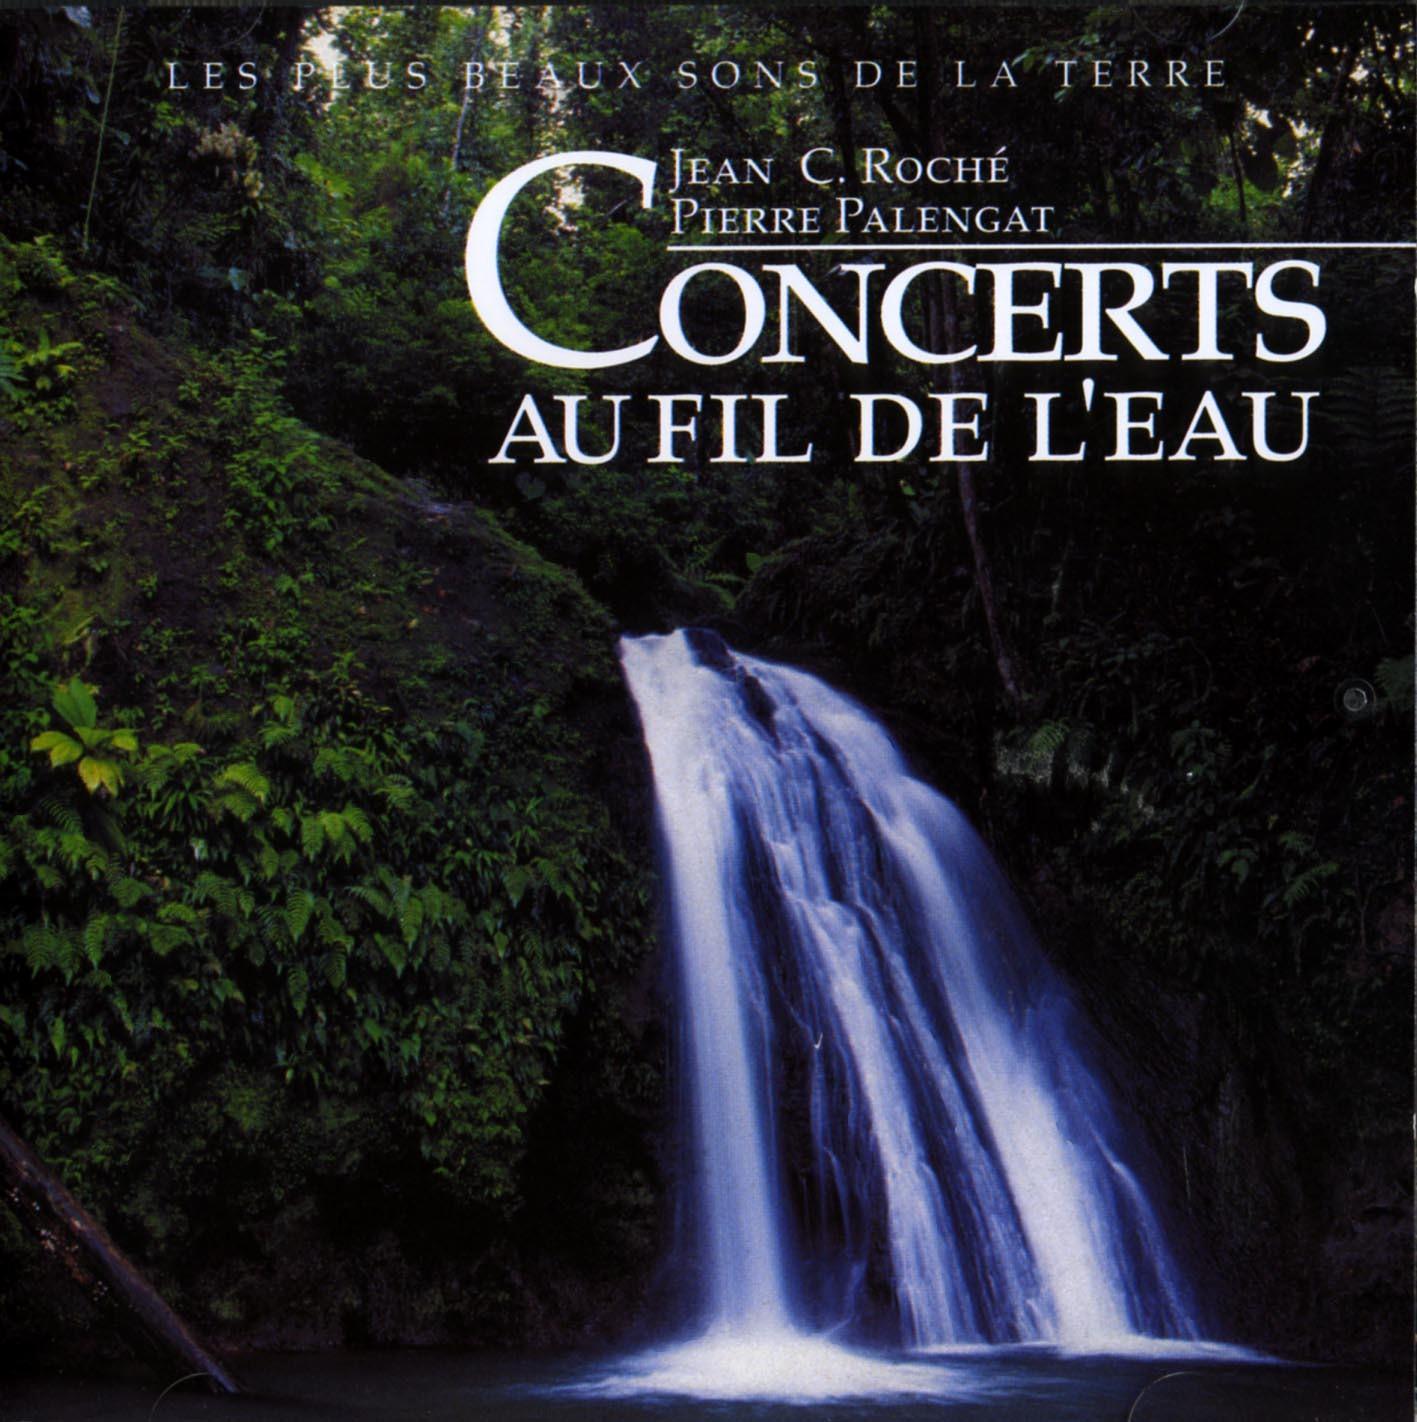 ORIGIN'S - CONCERTS AU FIL DE L'EAU - CD